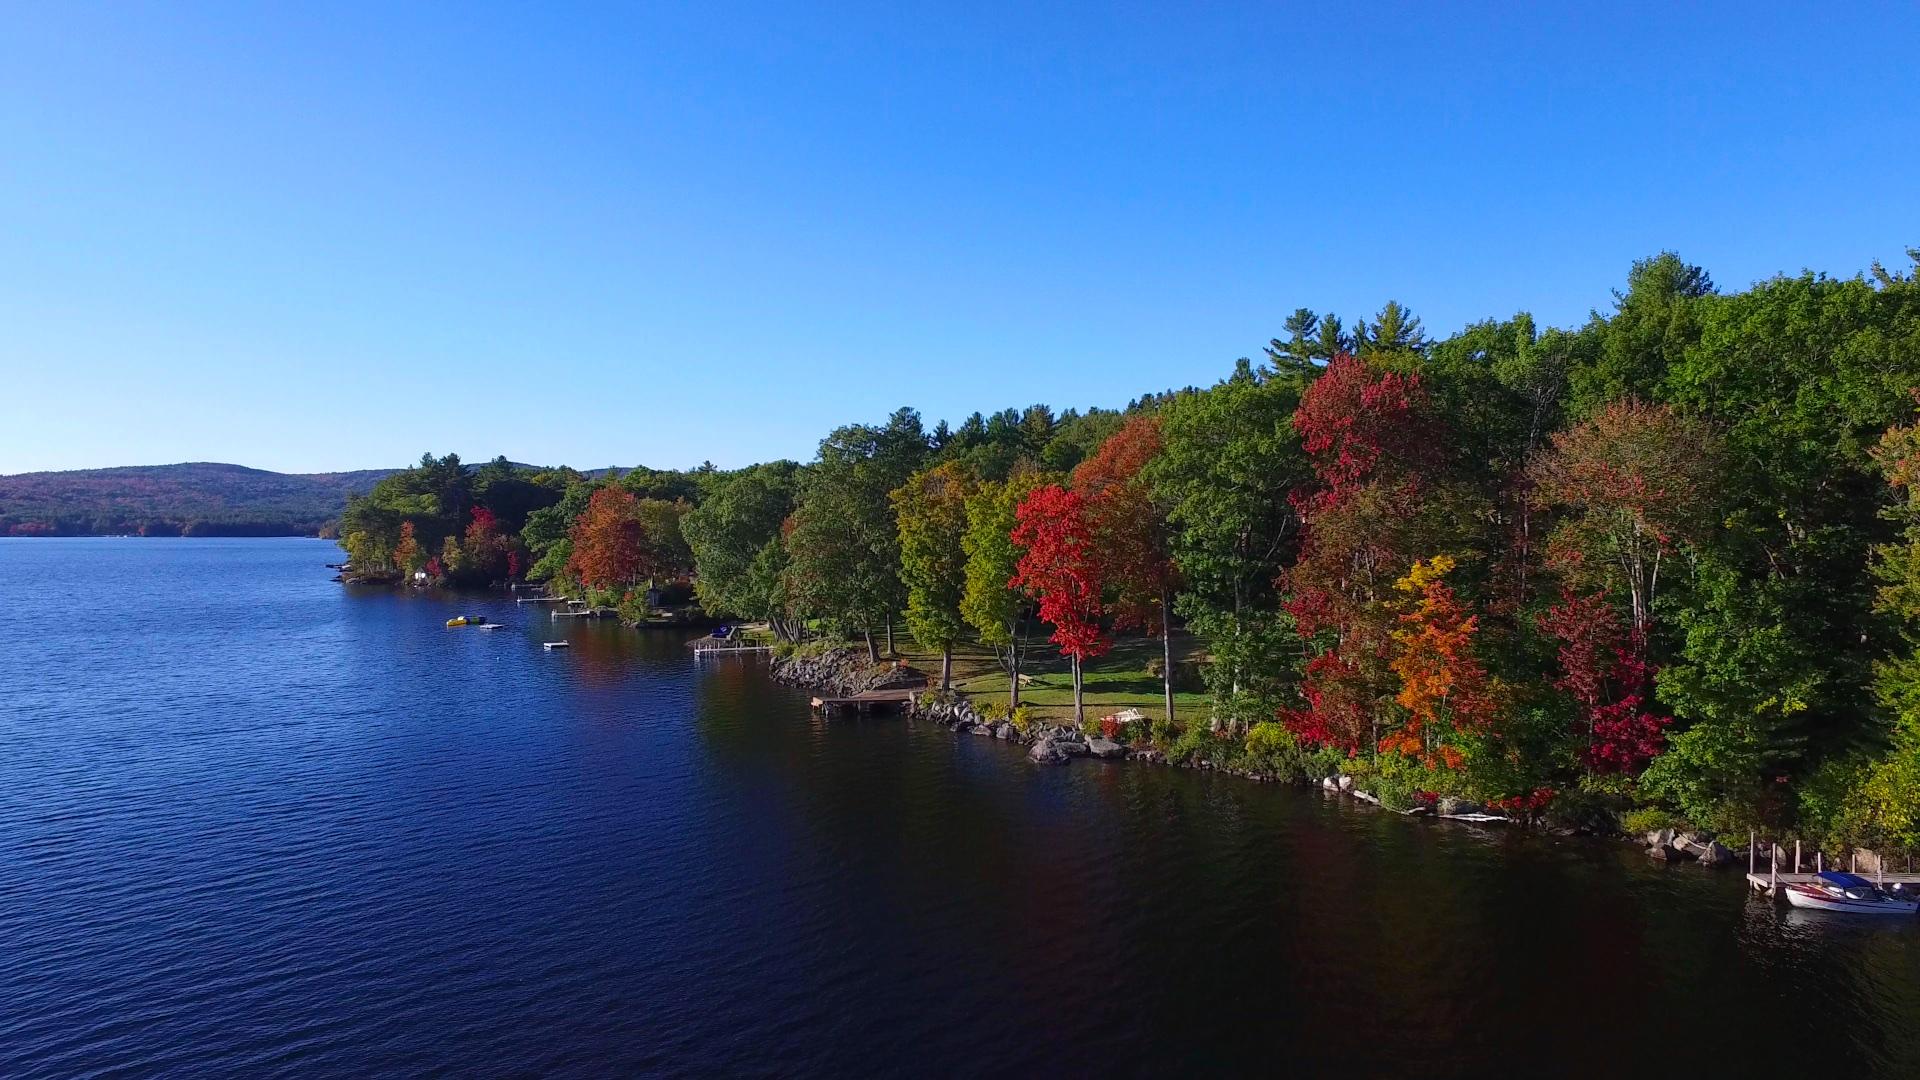 Terreno per Vendita alle ore 910 Lakeshore Drive, New London New London, New Hampshire, 03257 Stati Uniti